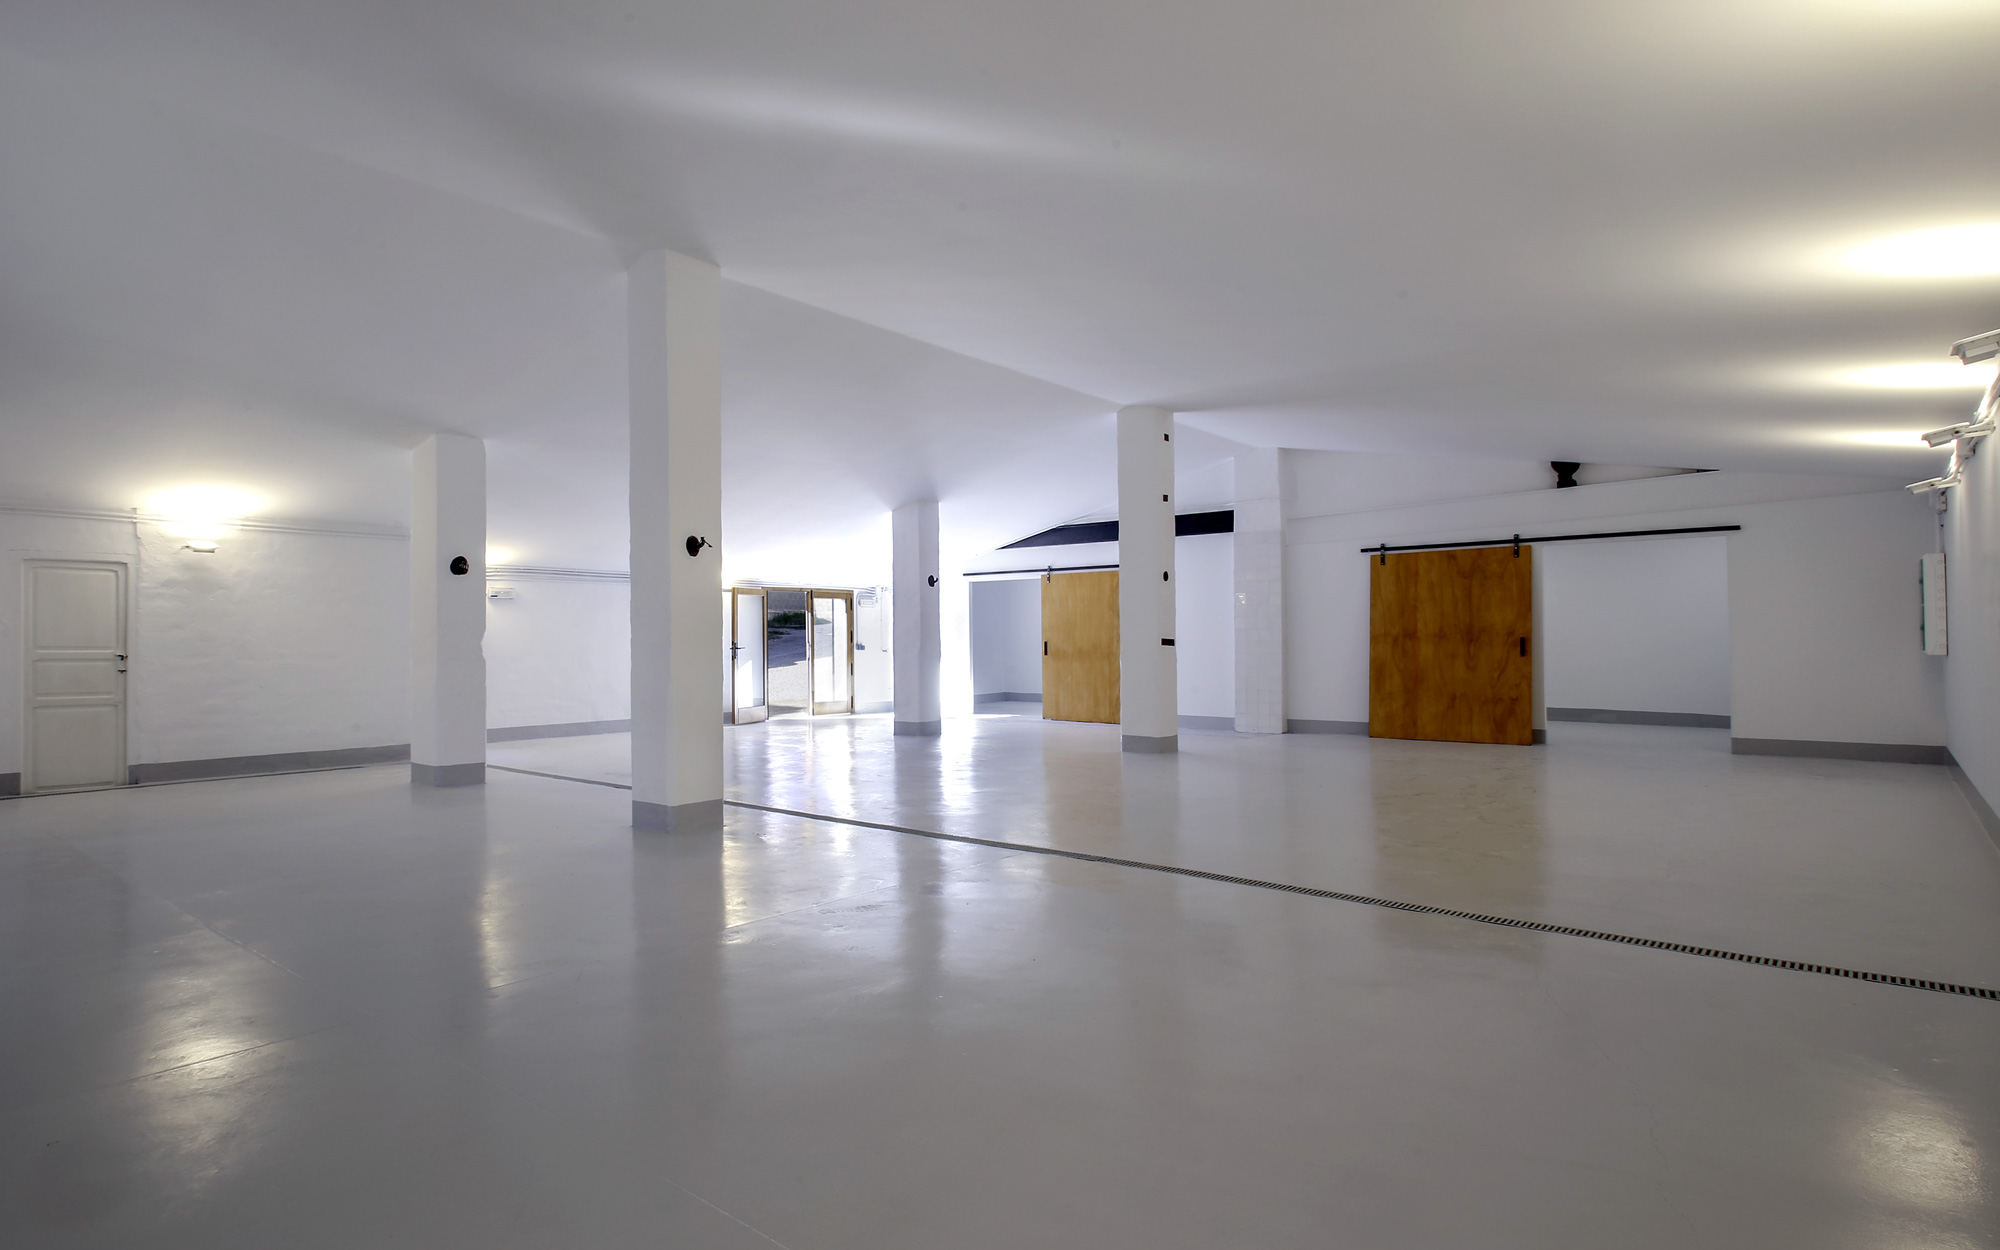 Vilaarquitectes estudio de arquitectura rehabilitaci n for Diseno de interiores valencia